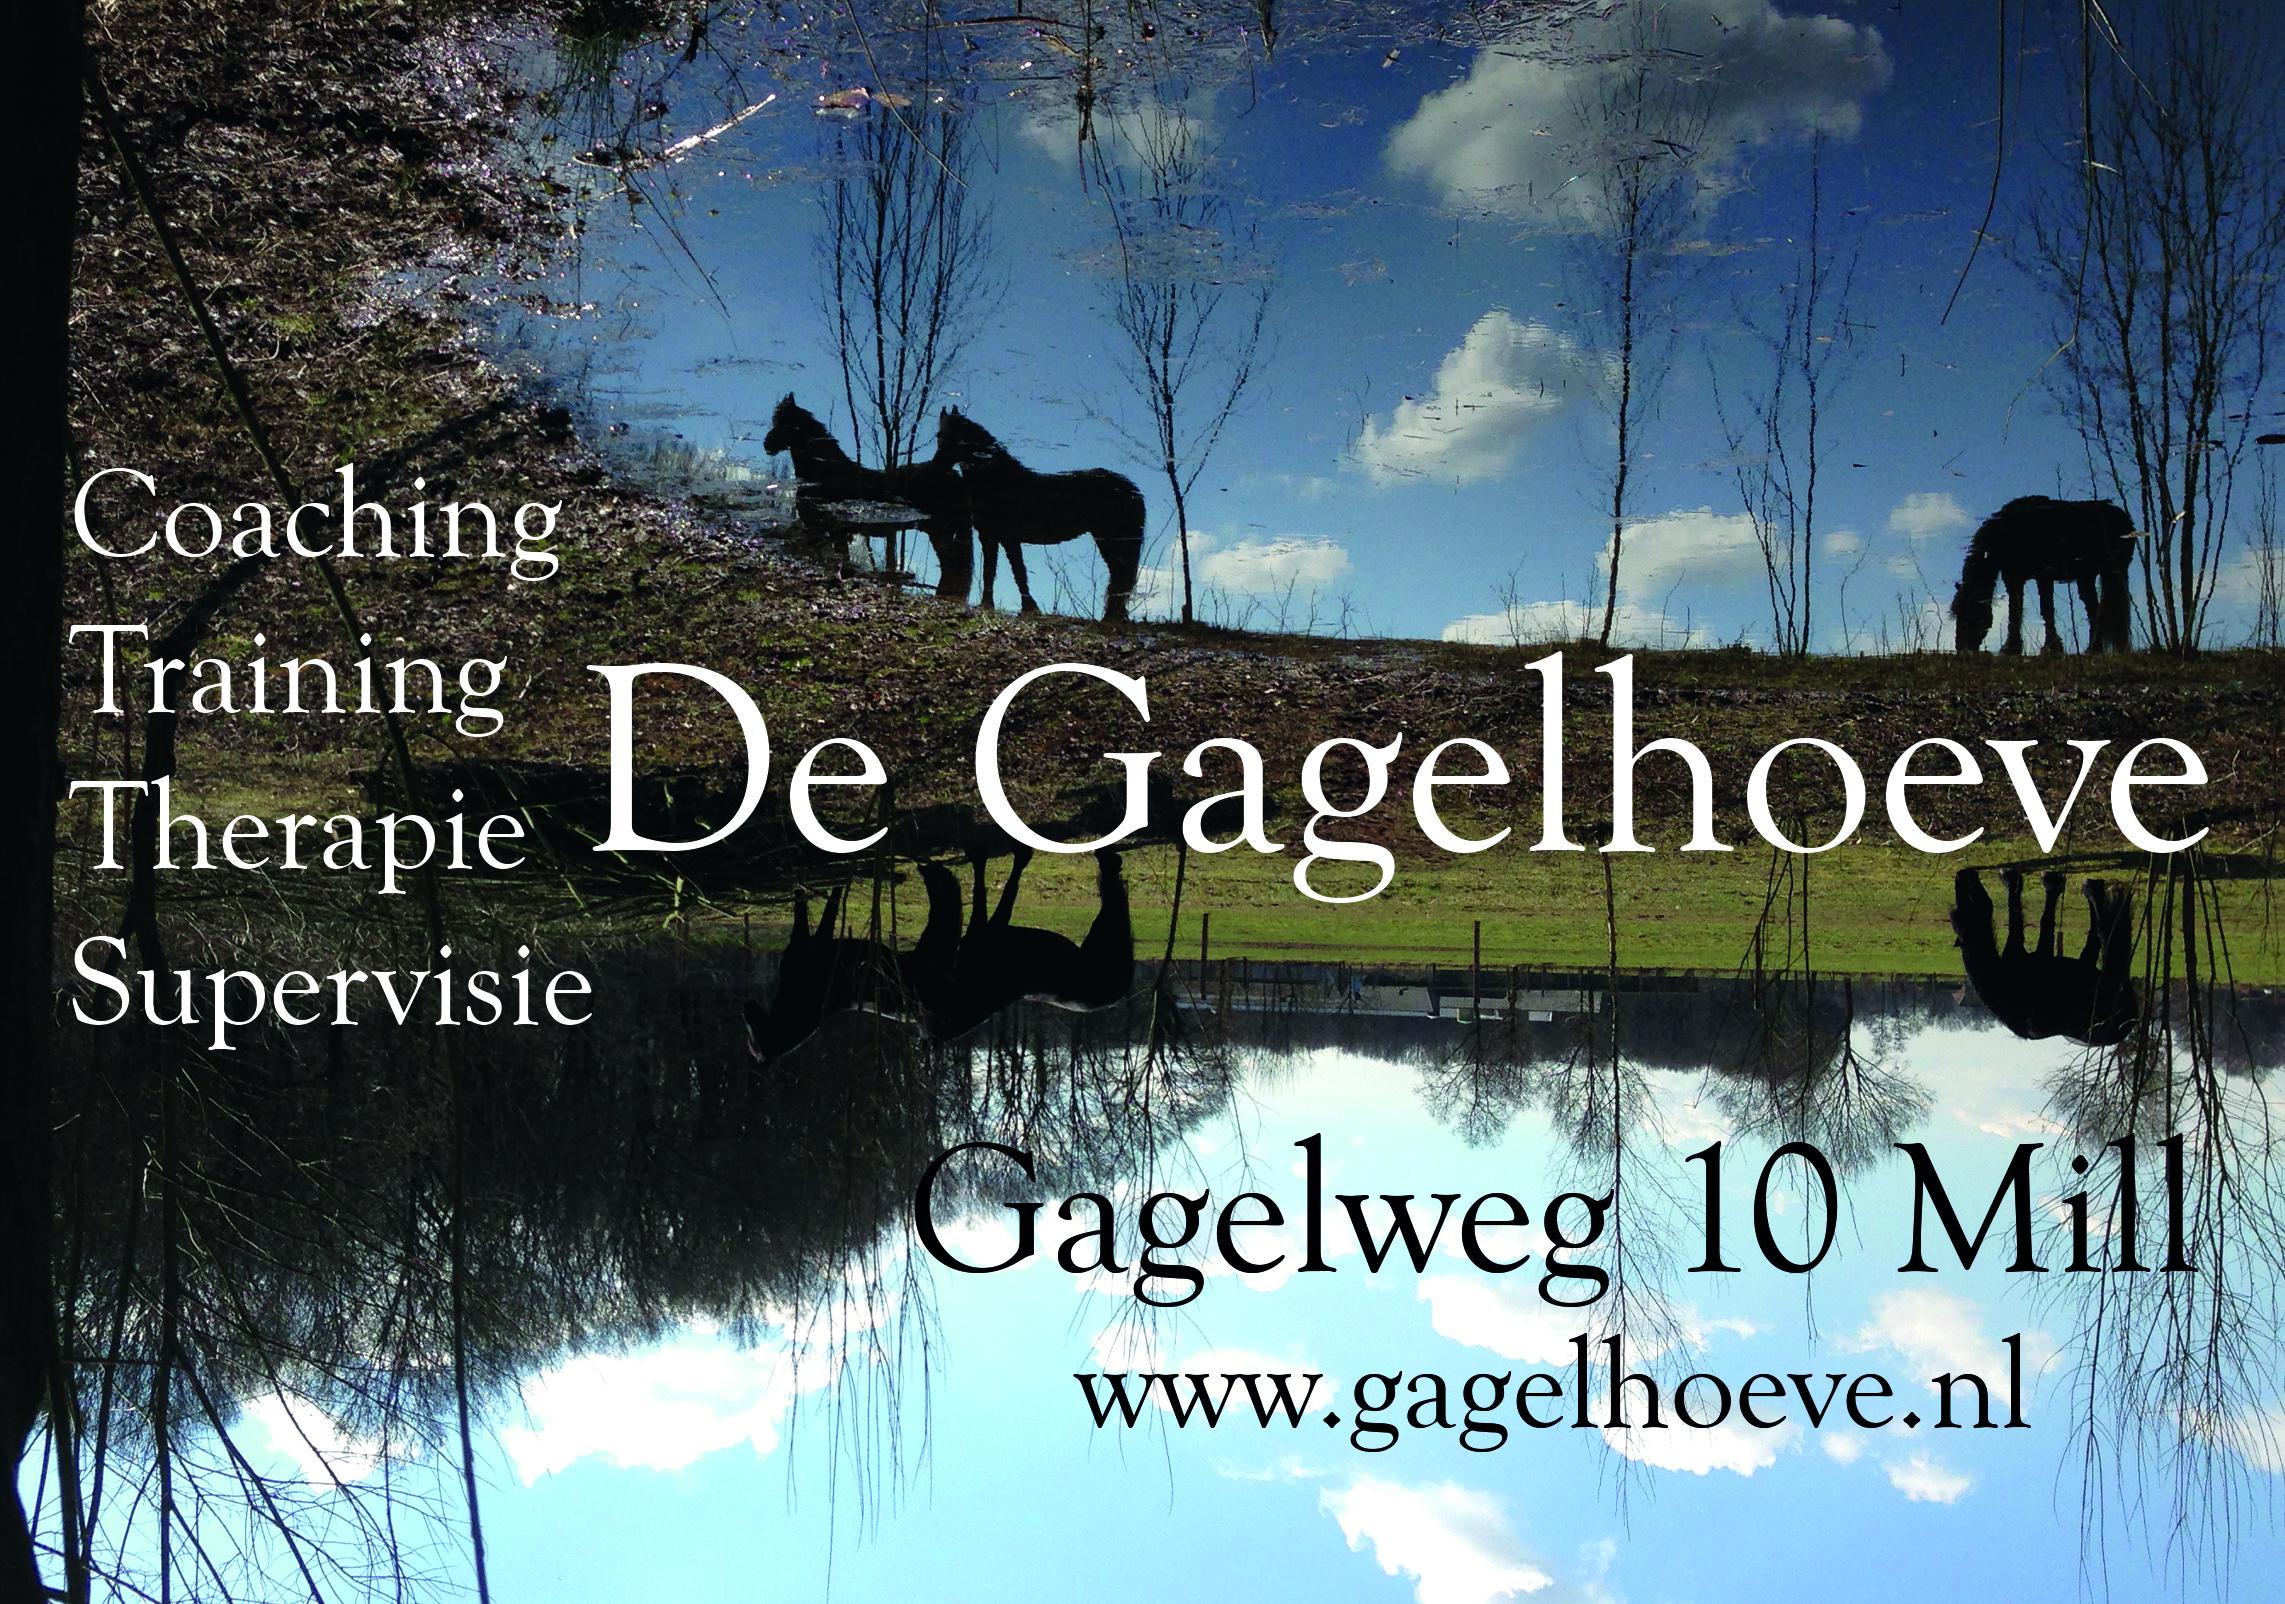 De Gagelhoeve logo